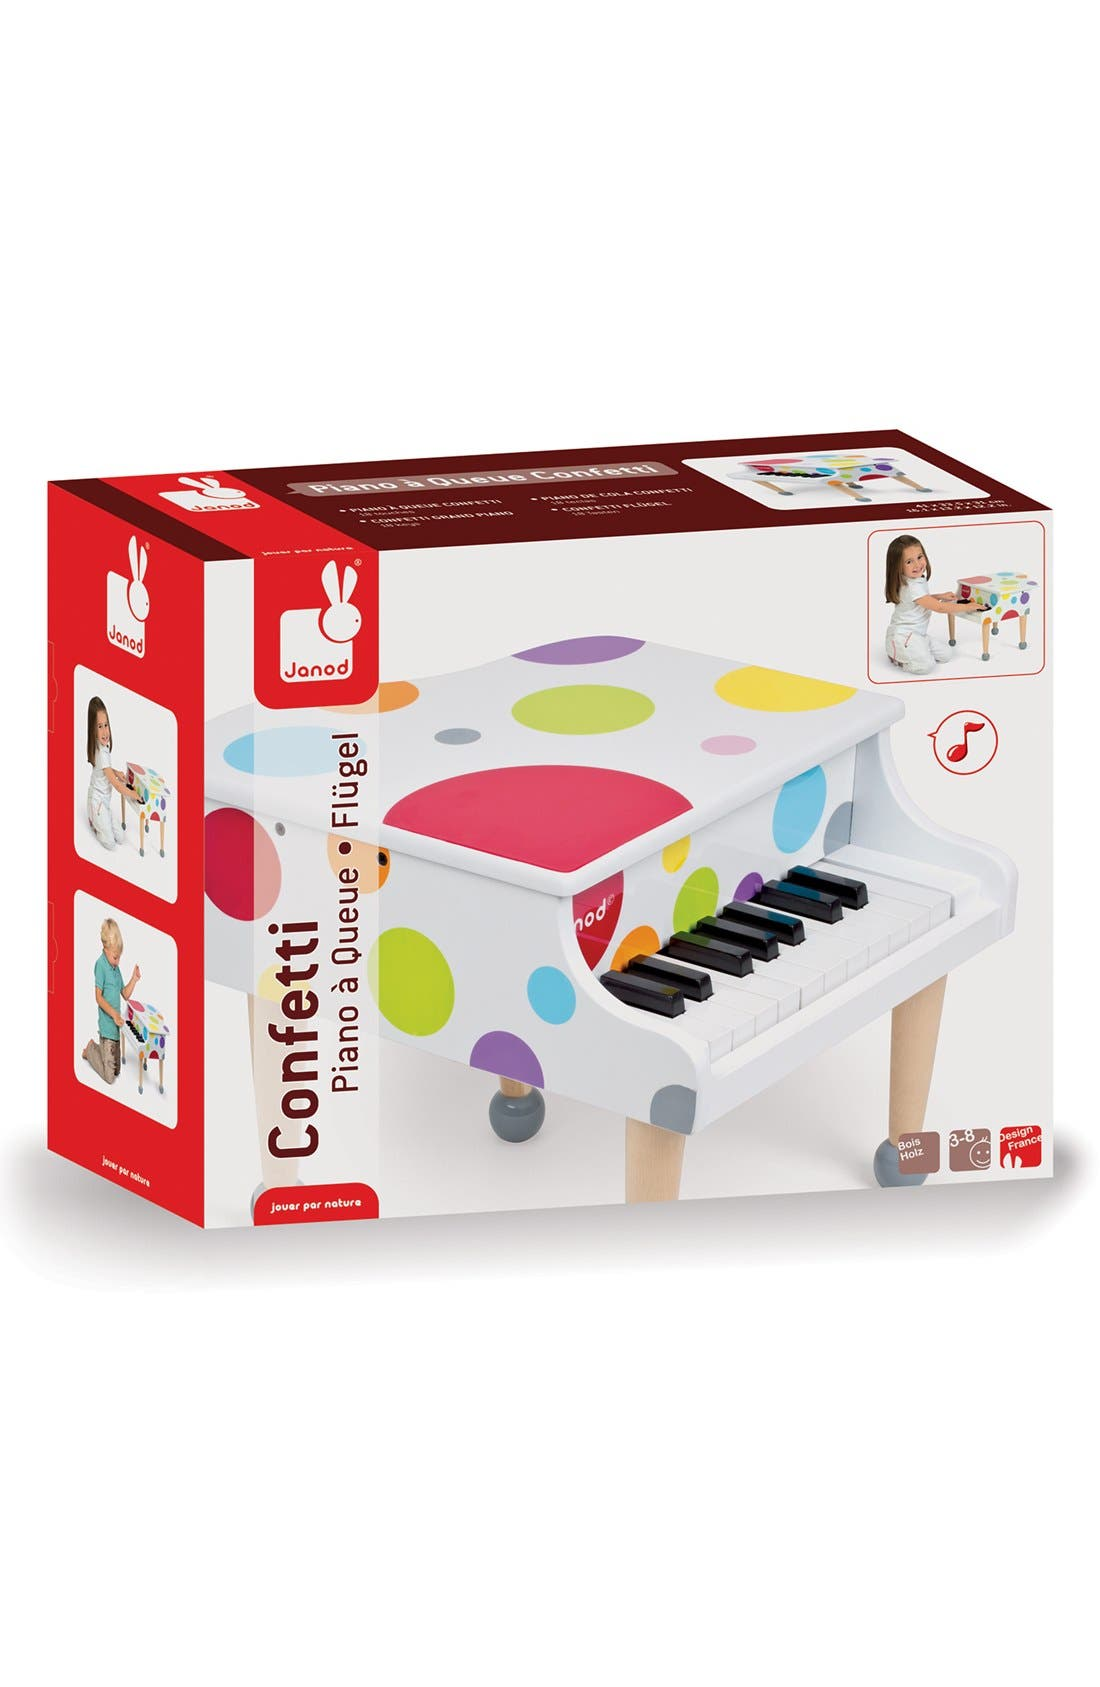 'Confetti' Grand Piano Play Set,                             Main thumbnail 1, color,                             MULTI